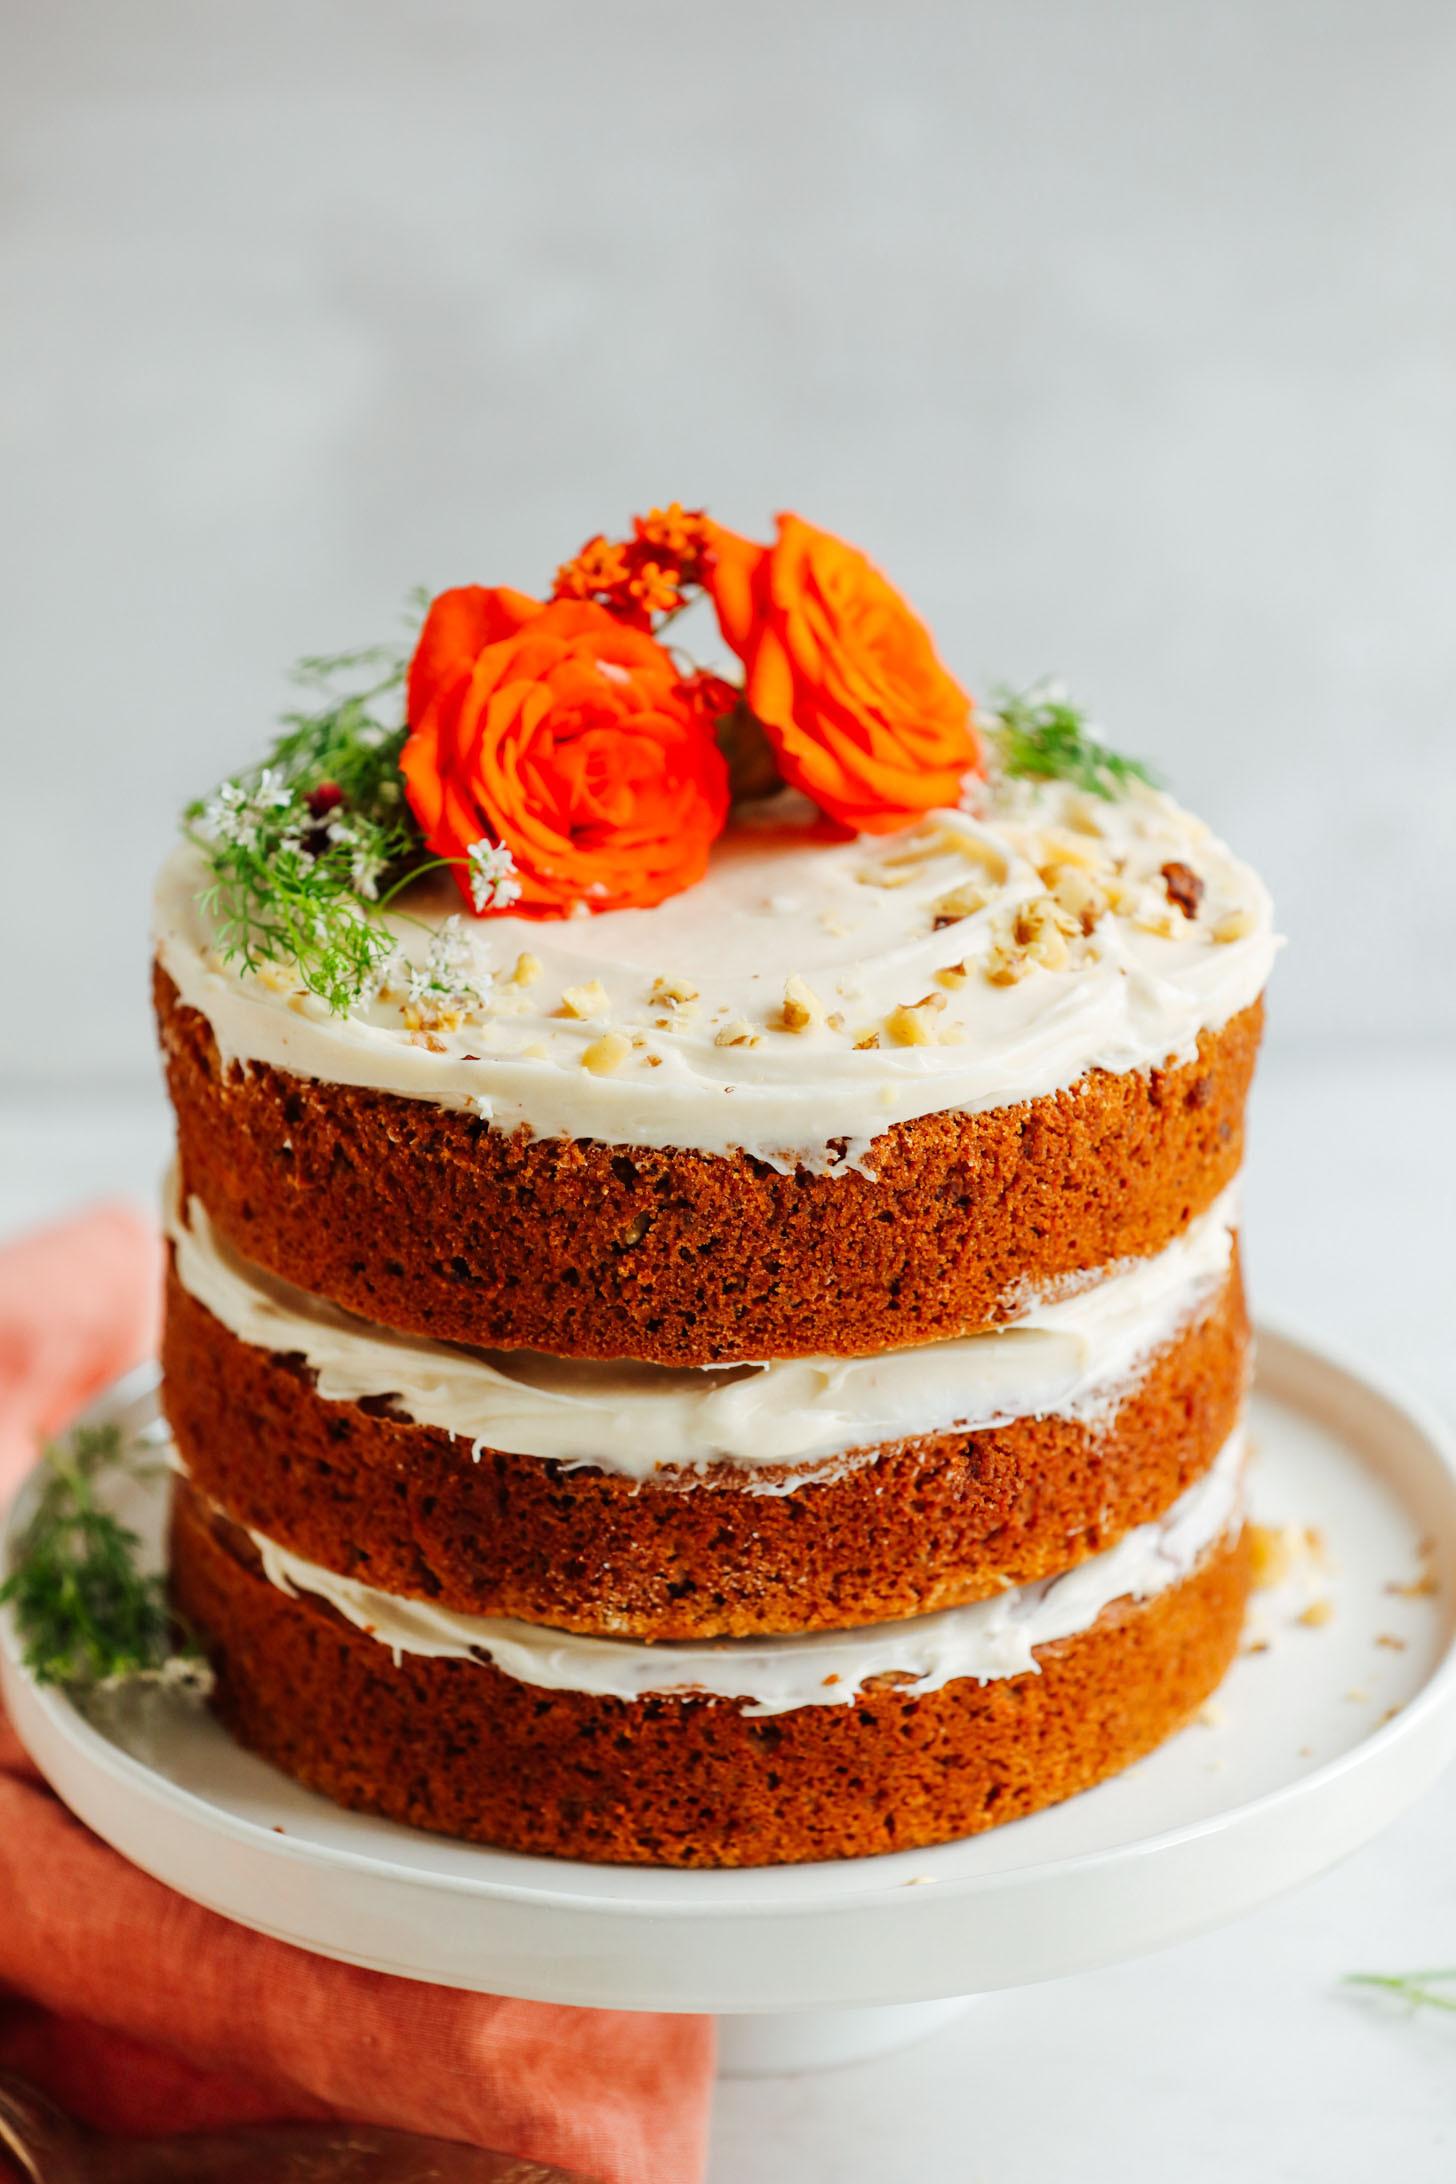 Free Birthday Dessert  Vegan Gluten Free Carrot Cake